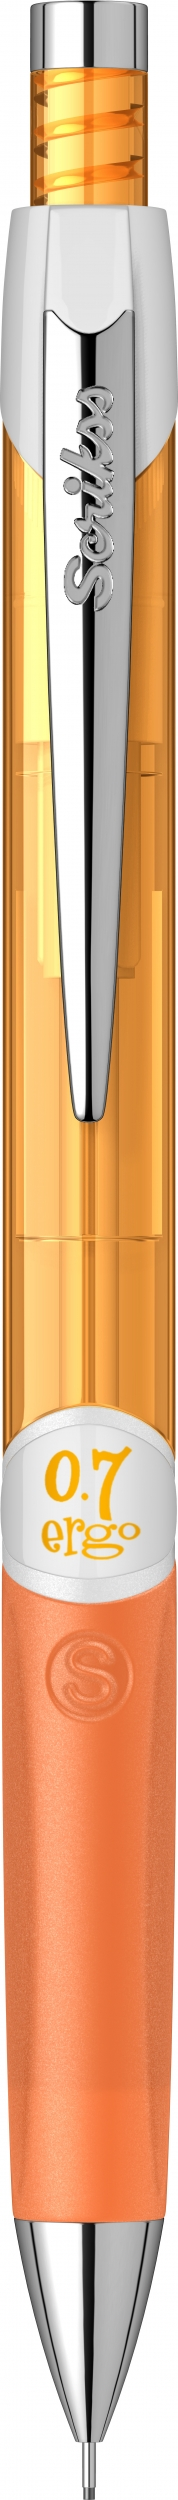 Механичен молив Ergo Scrikss 0,7мм., модел 72209, , Неон Оранжев